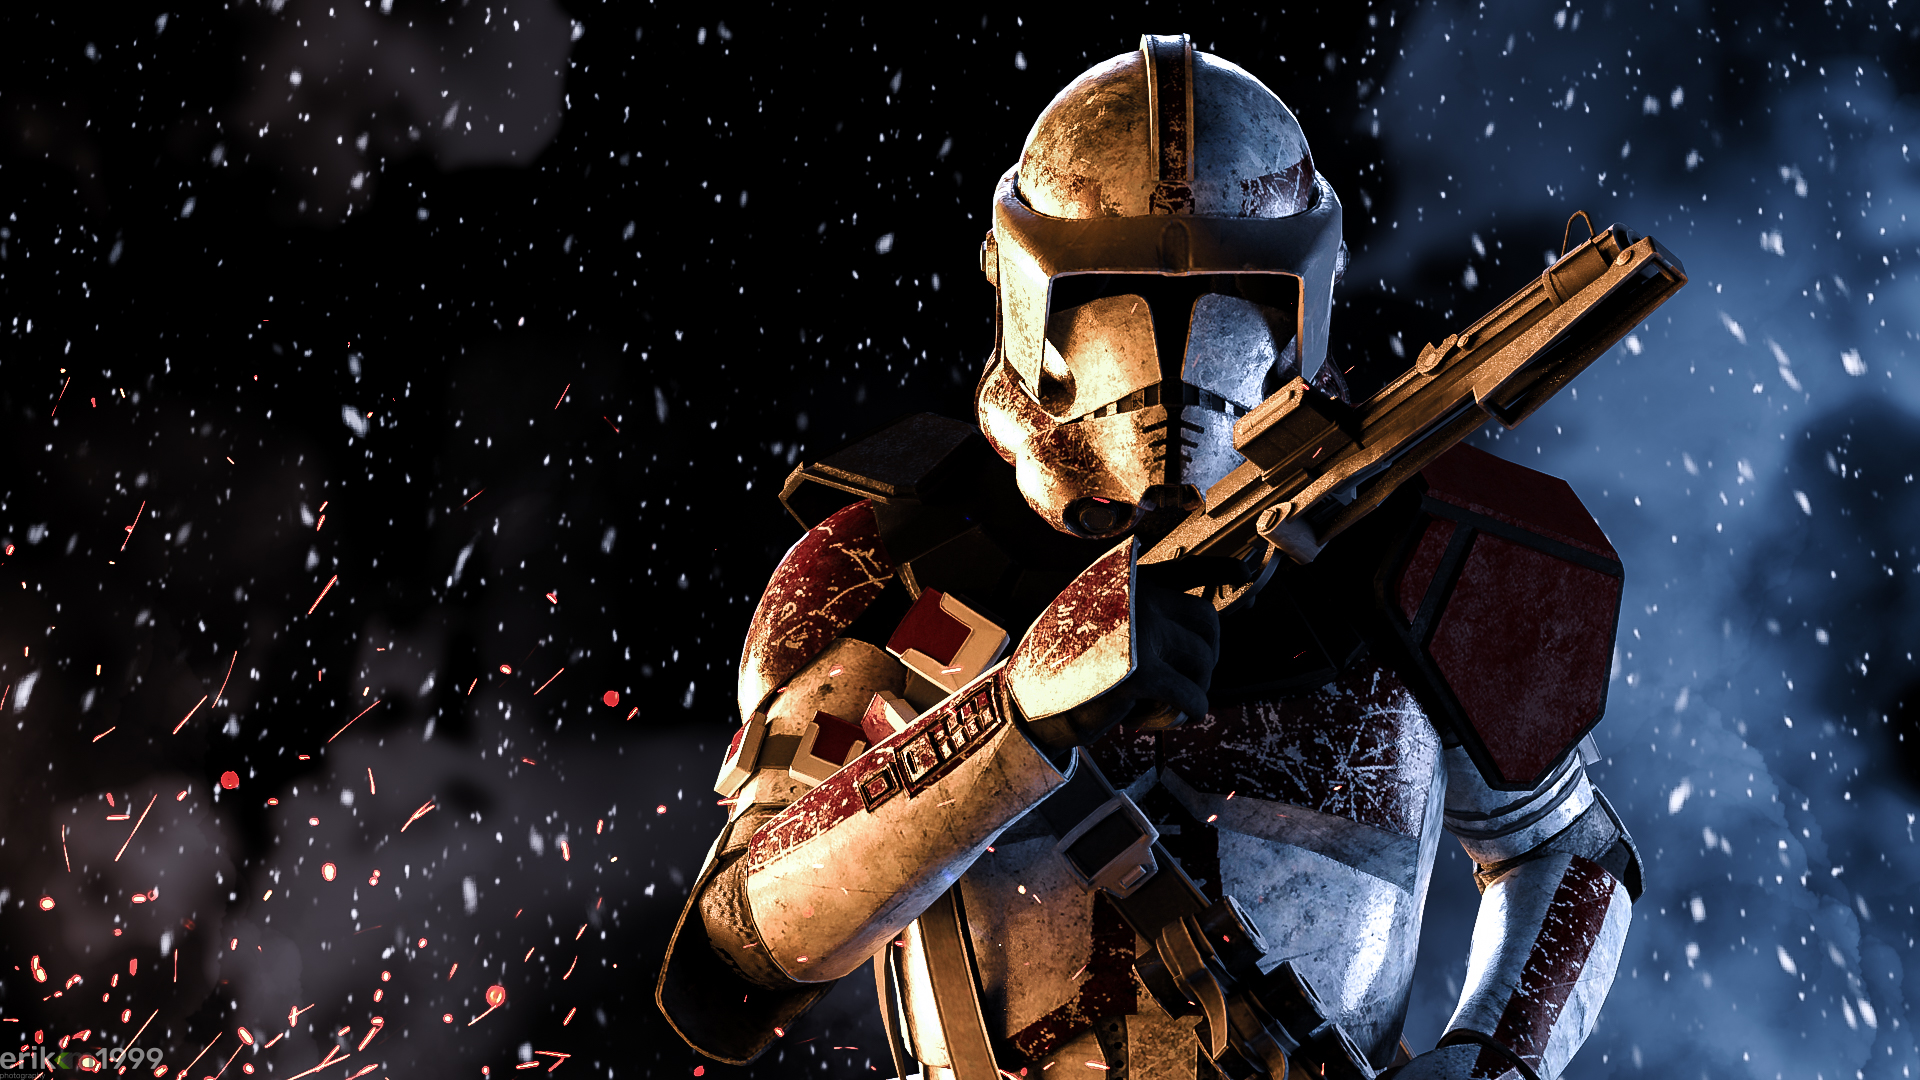 1080p Star Wars Wallpapers Posted By Samantha Mercado